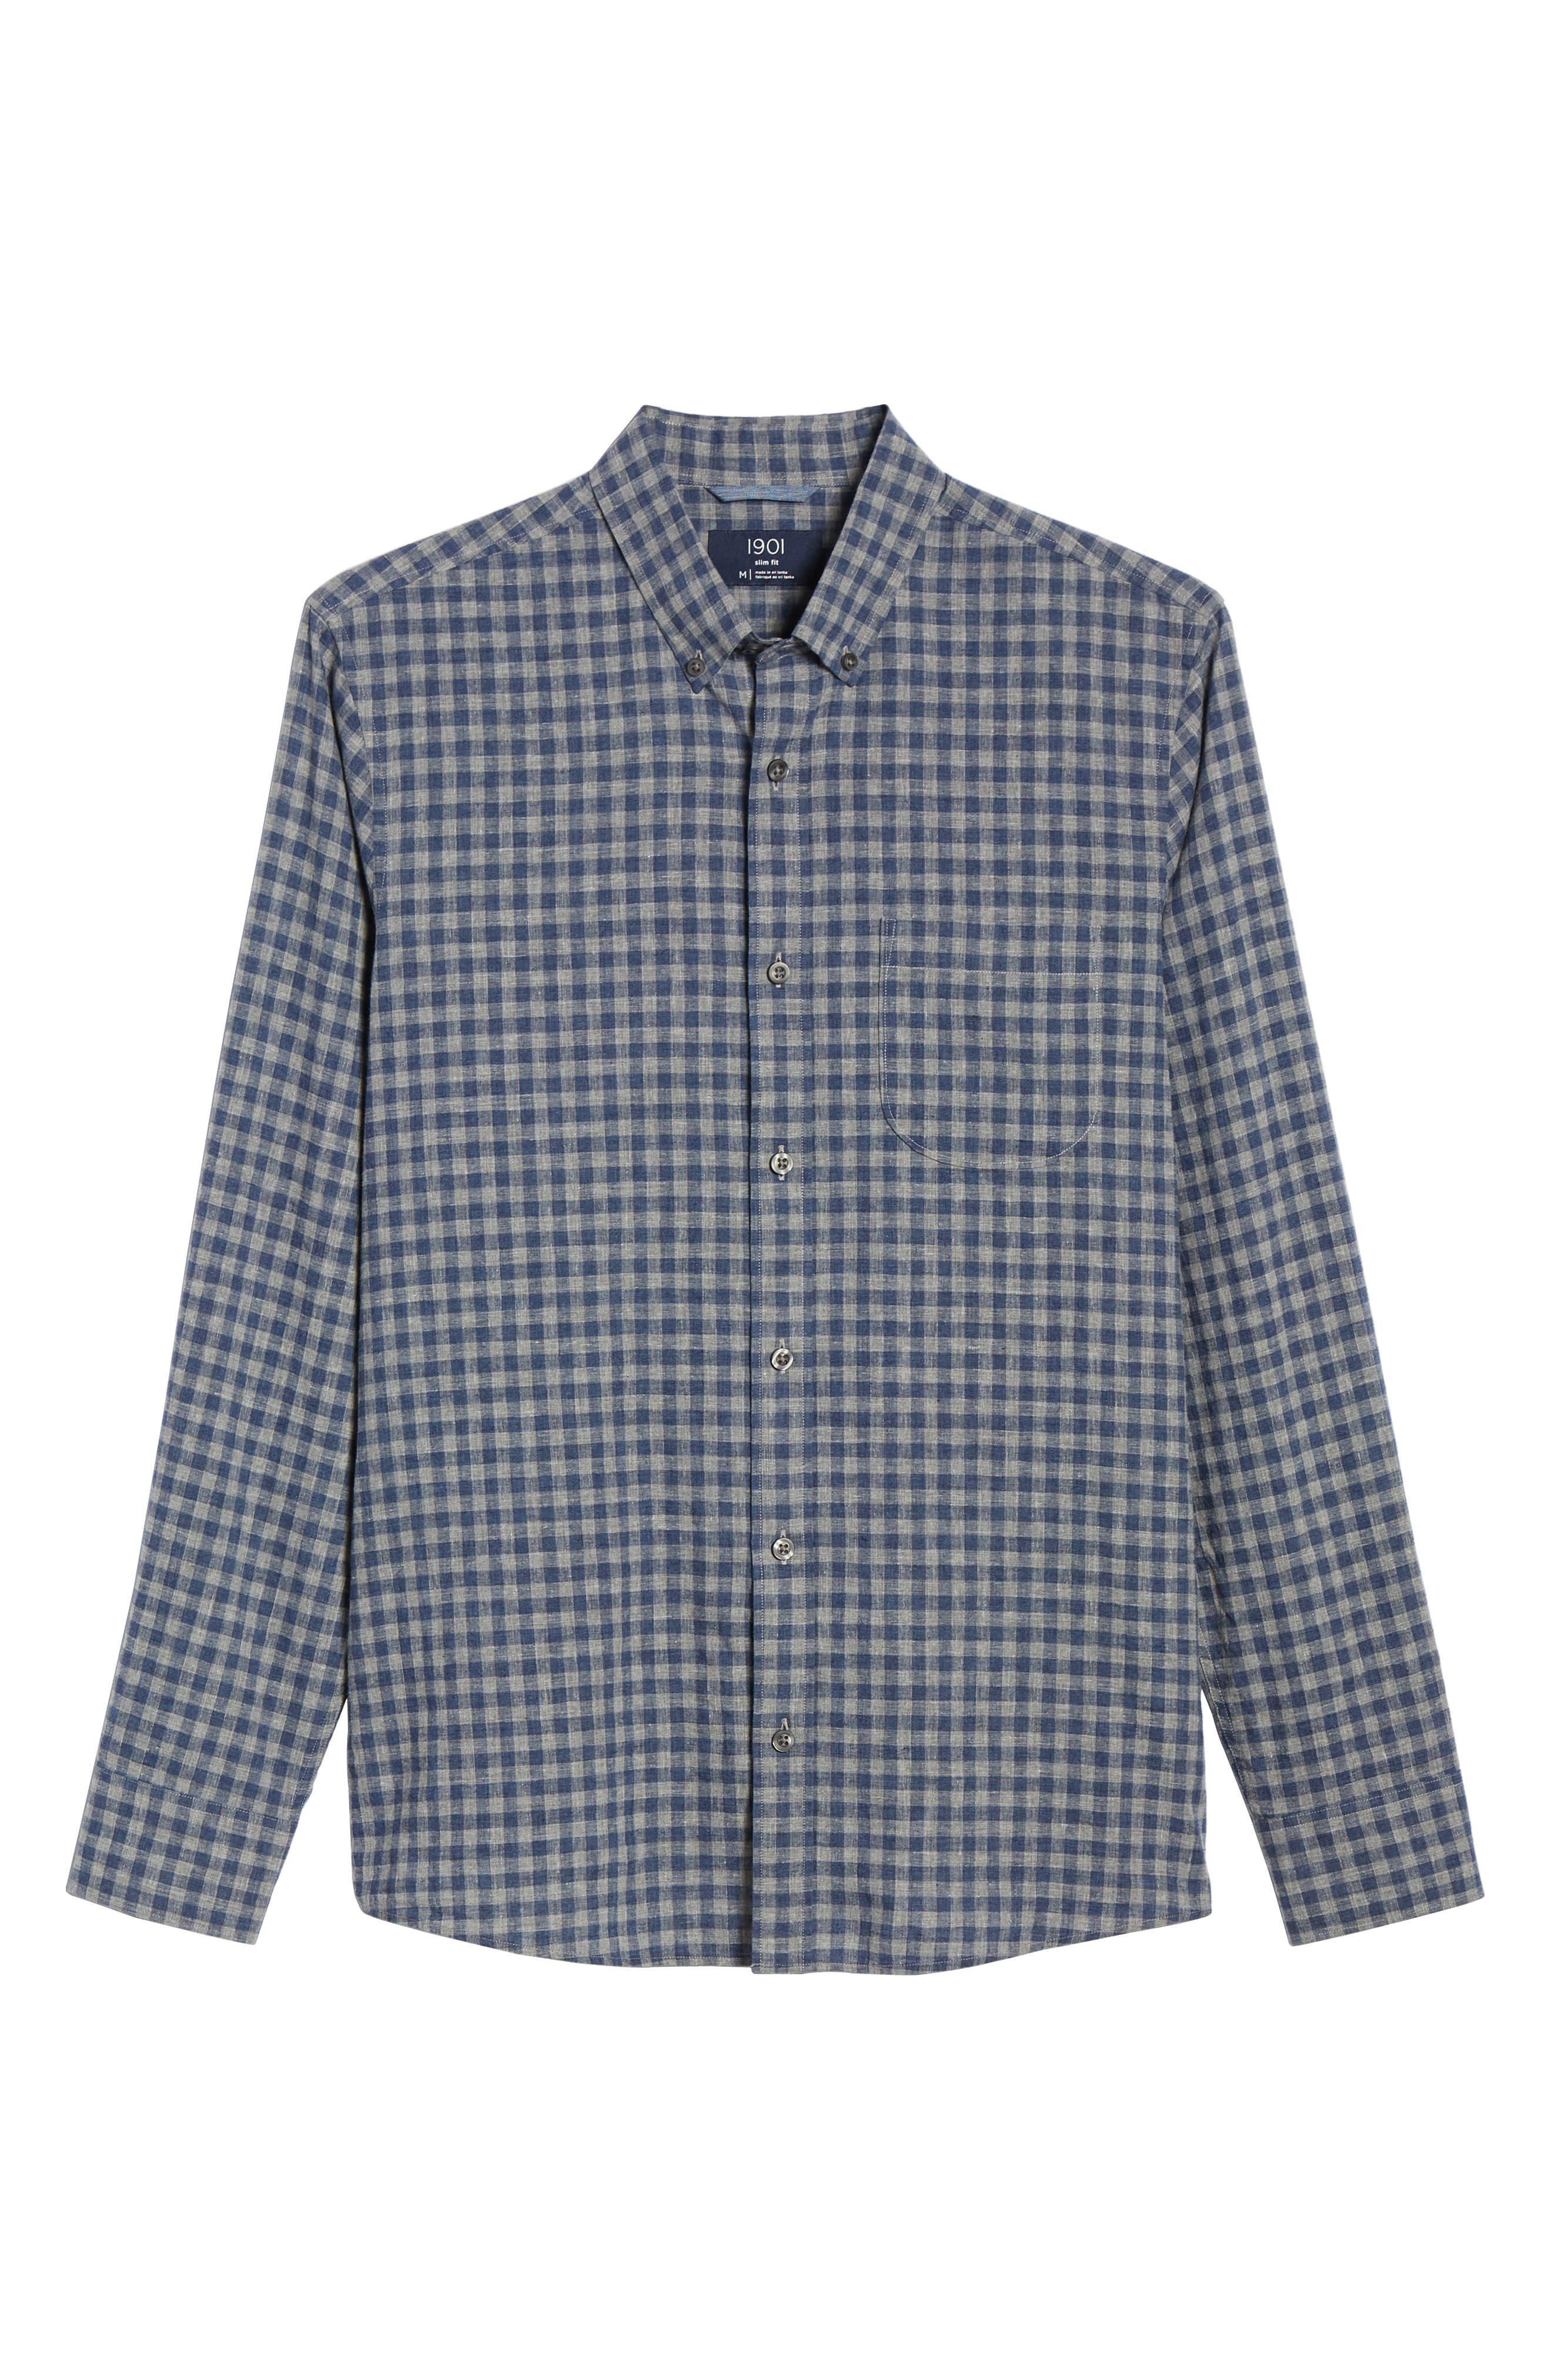 1901,                             Button Down Heather Gingham Linen Blend Sport Shirt,                             Alternate thumbnail 5, color,                             GREY OIL NAVY GINGHAM